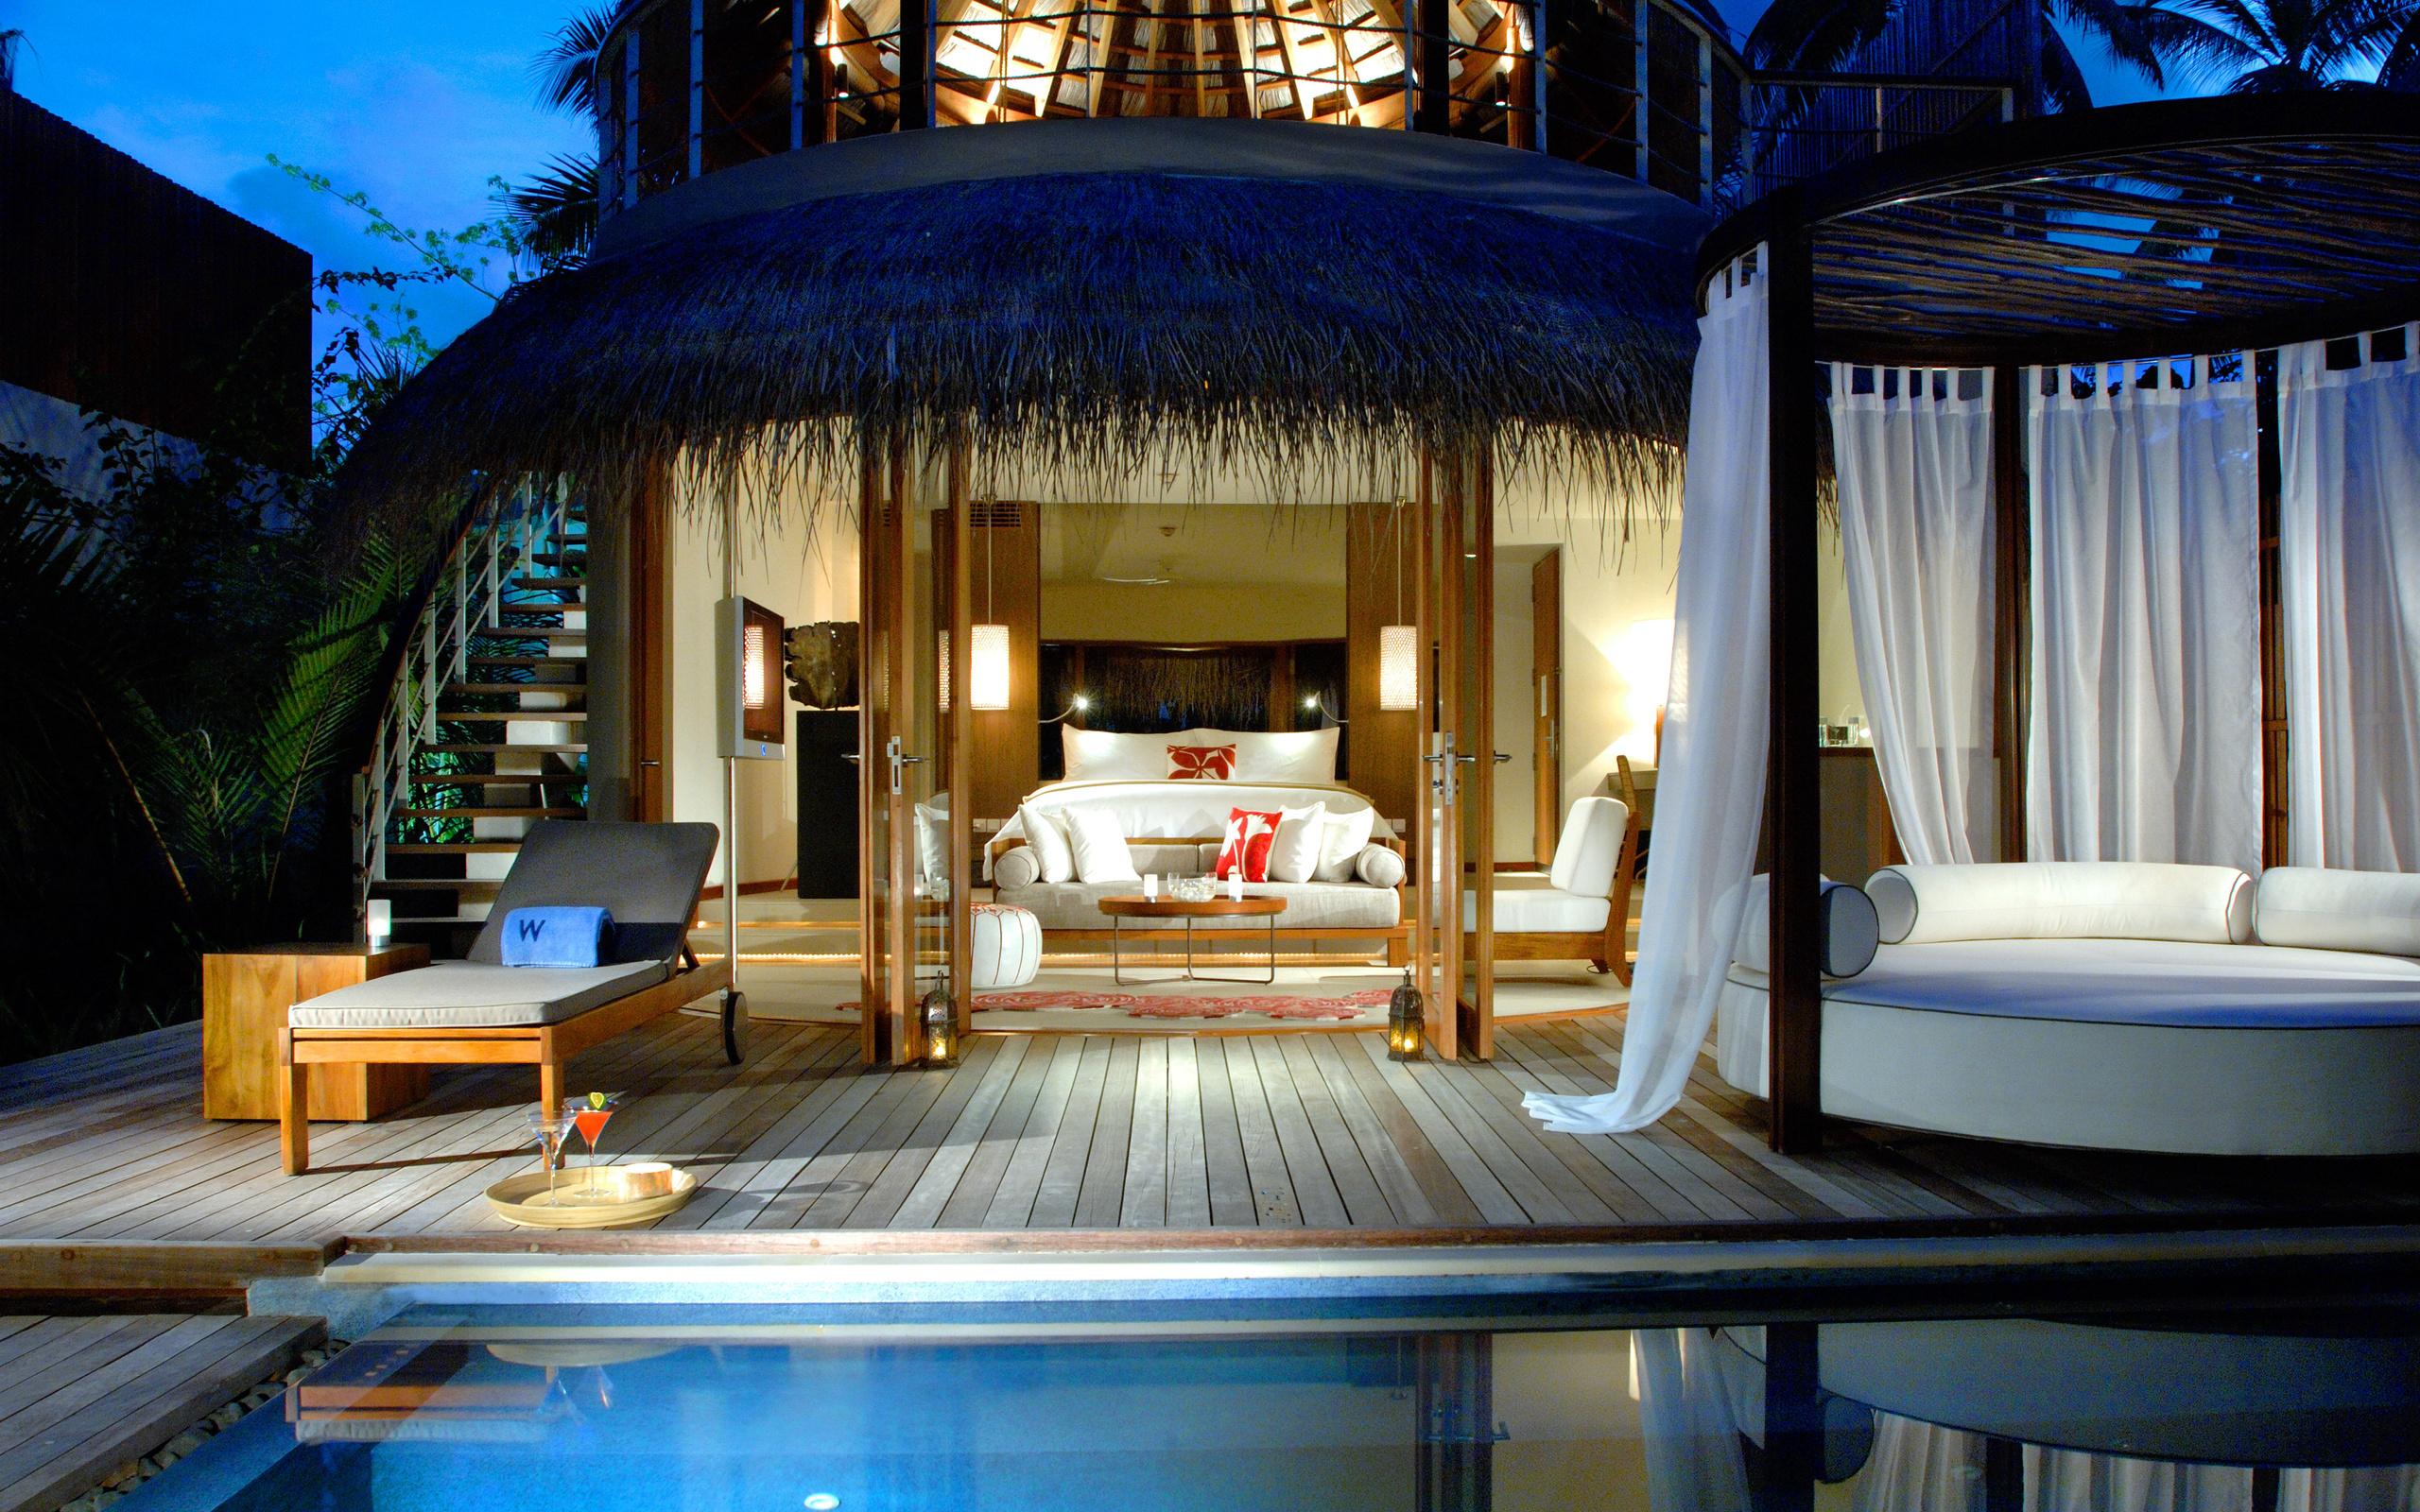 Bedroom Pool House Bungalow Cottage Maldives Design